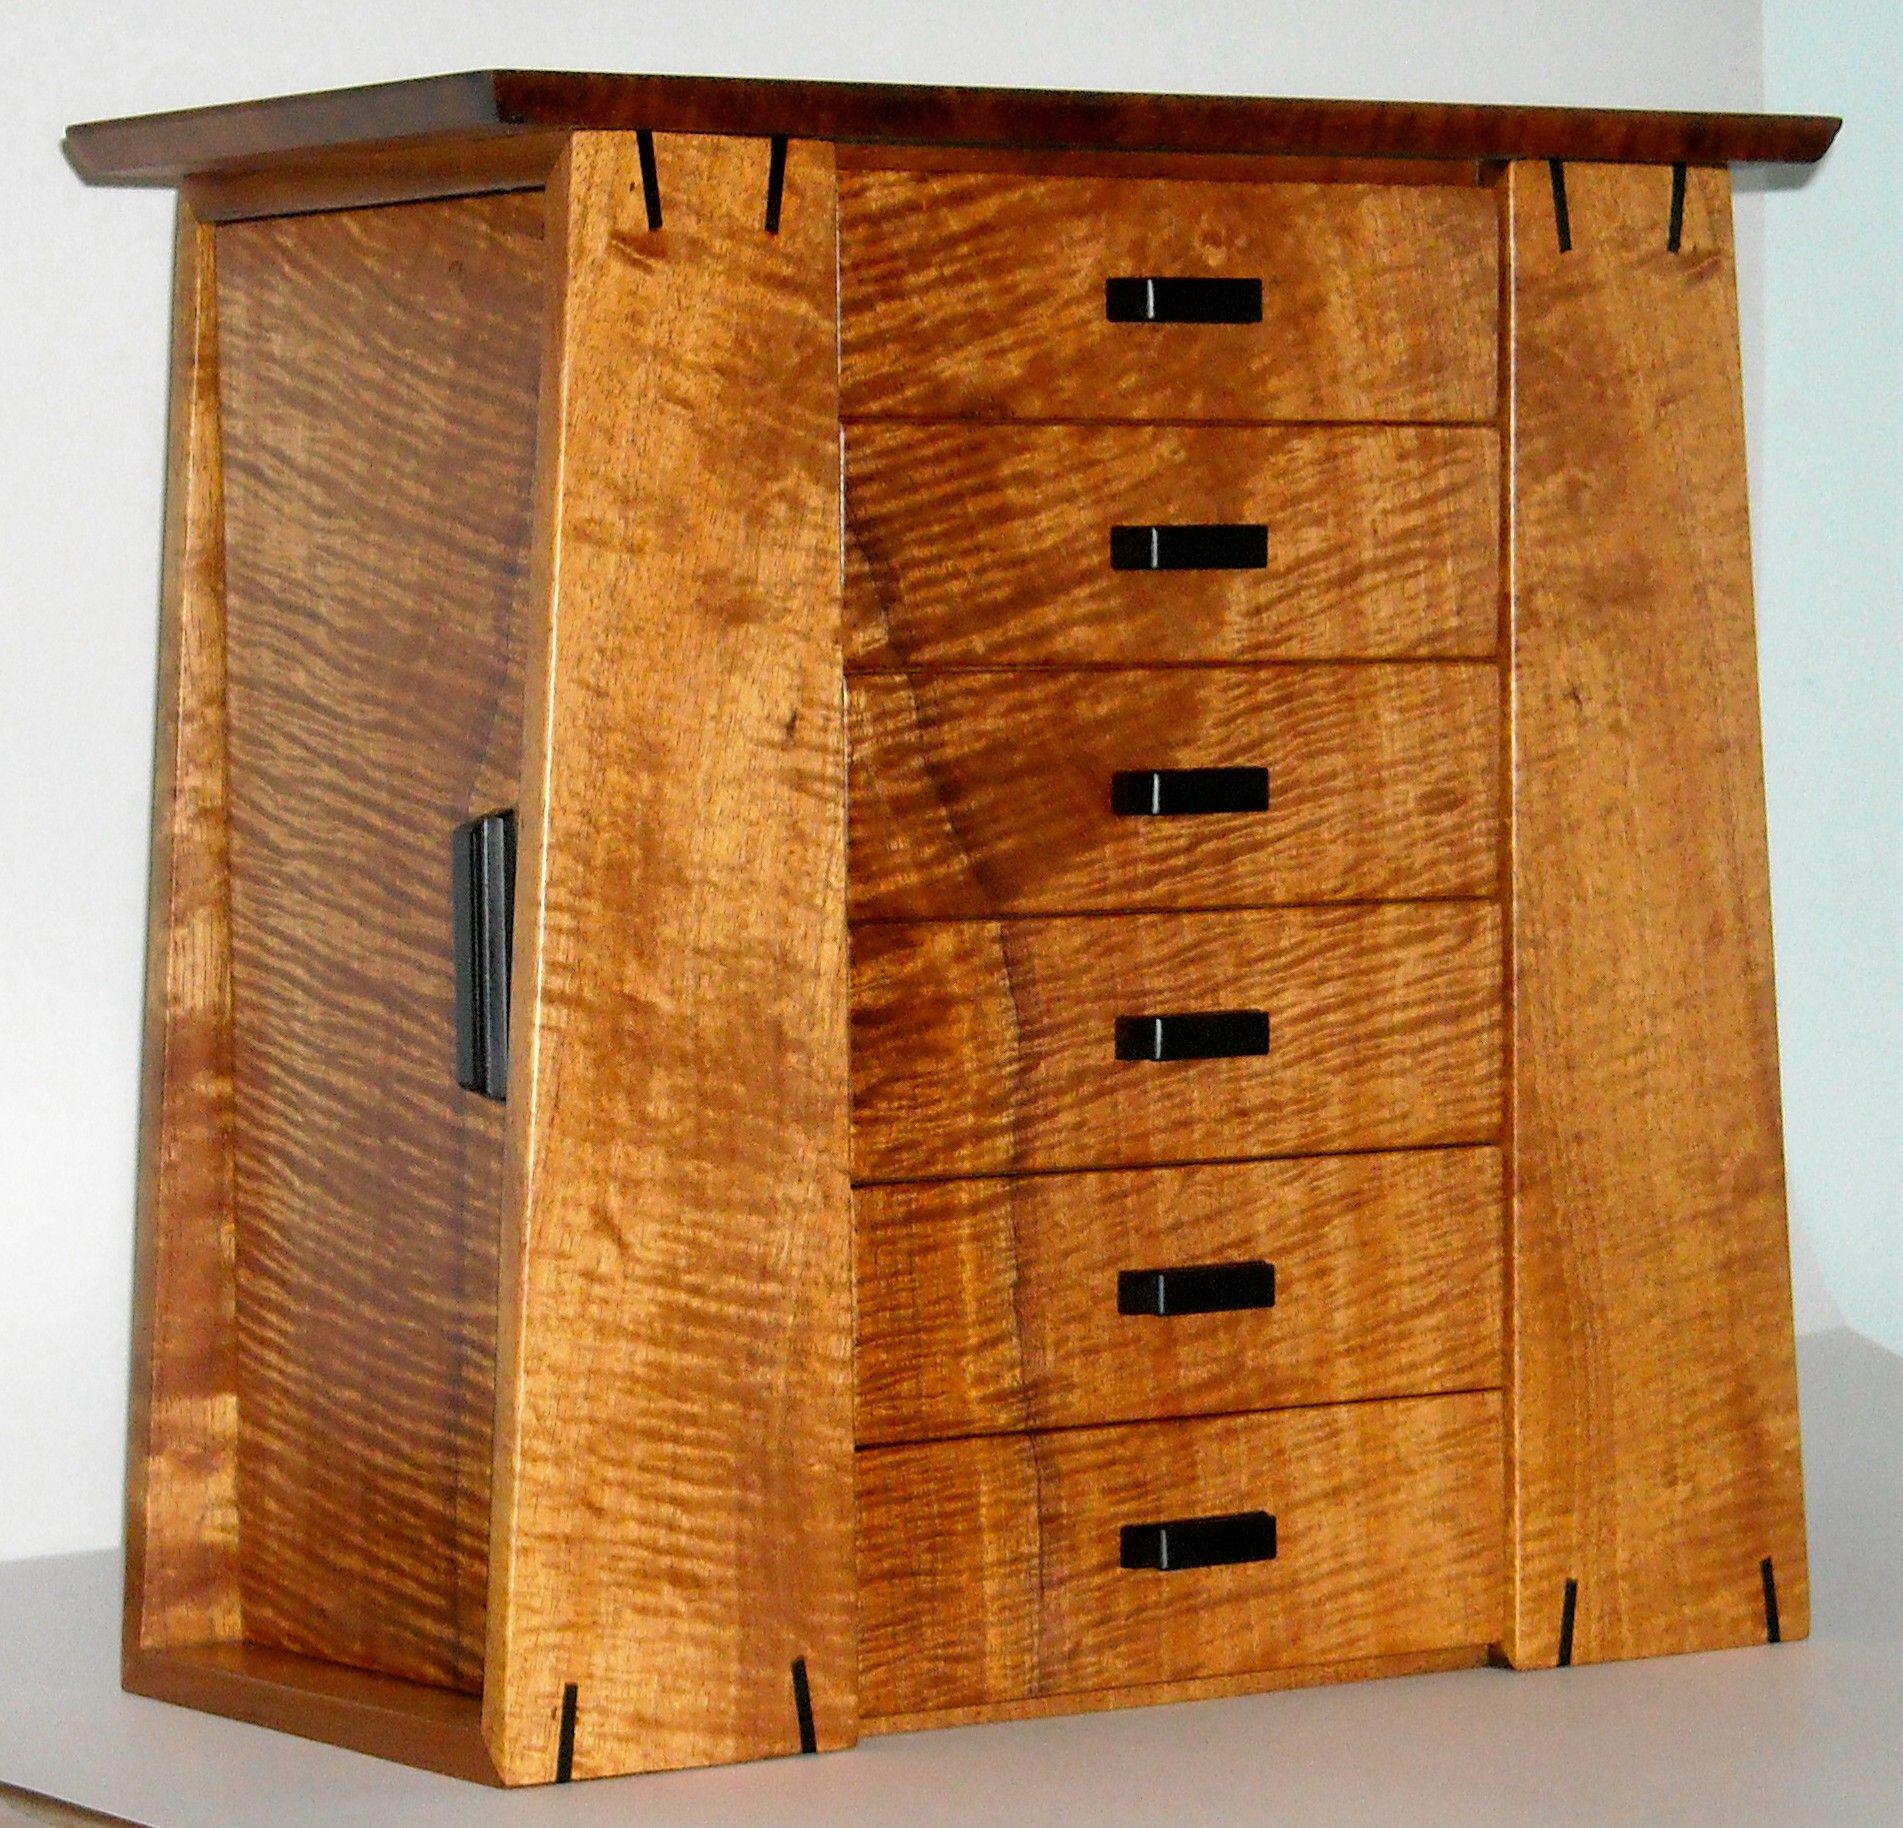 Koa Jewelry Box created by Thomas Pasquale of Kuaaina Artworks www